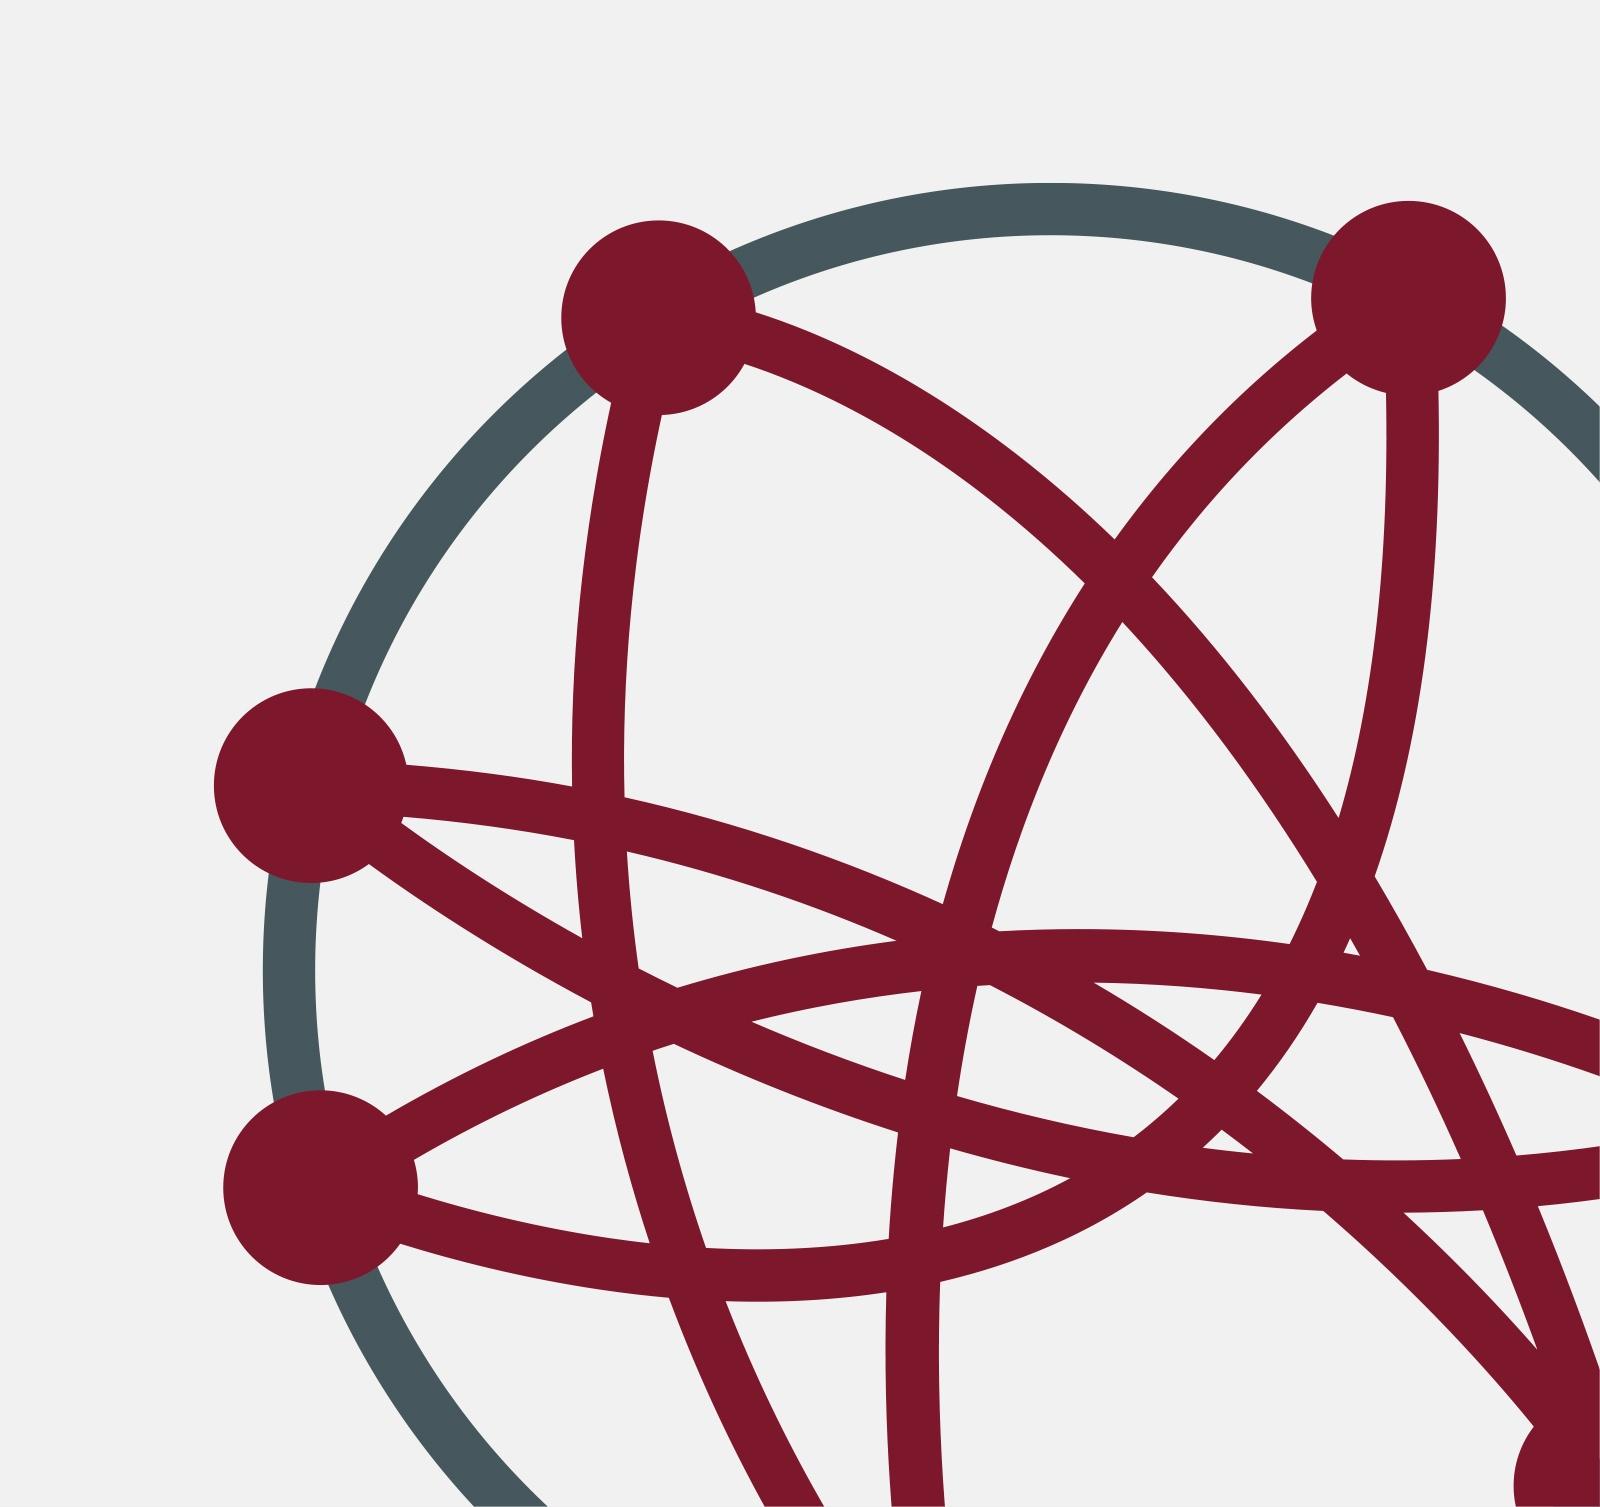 graphic-designer-sheffield-logo-design-itops-east-midland-chamber-soyo-design